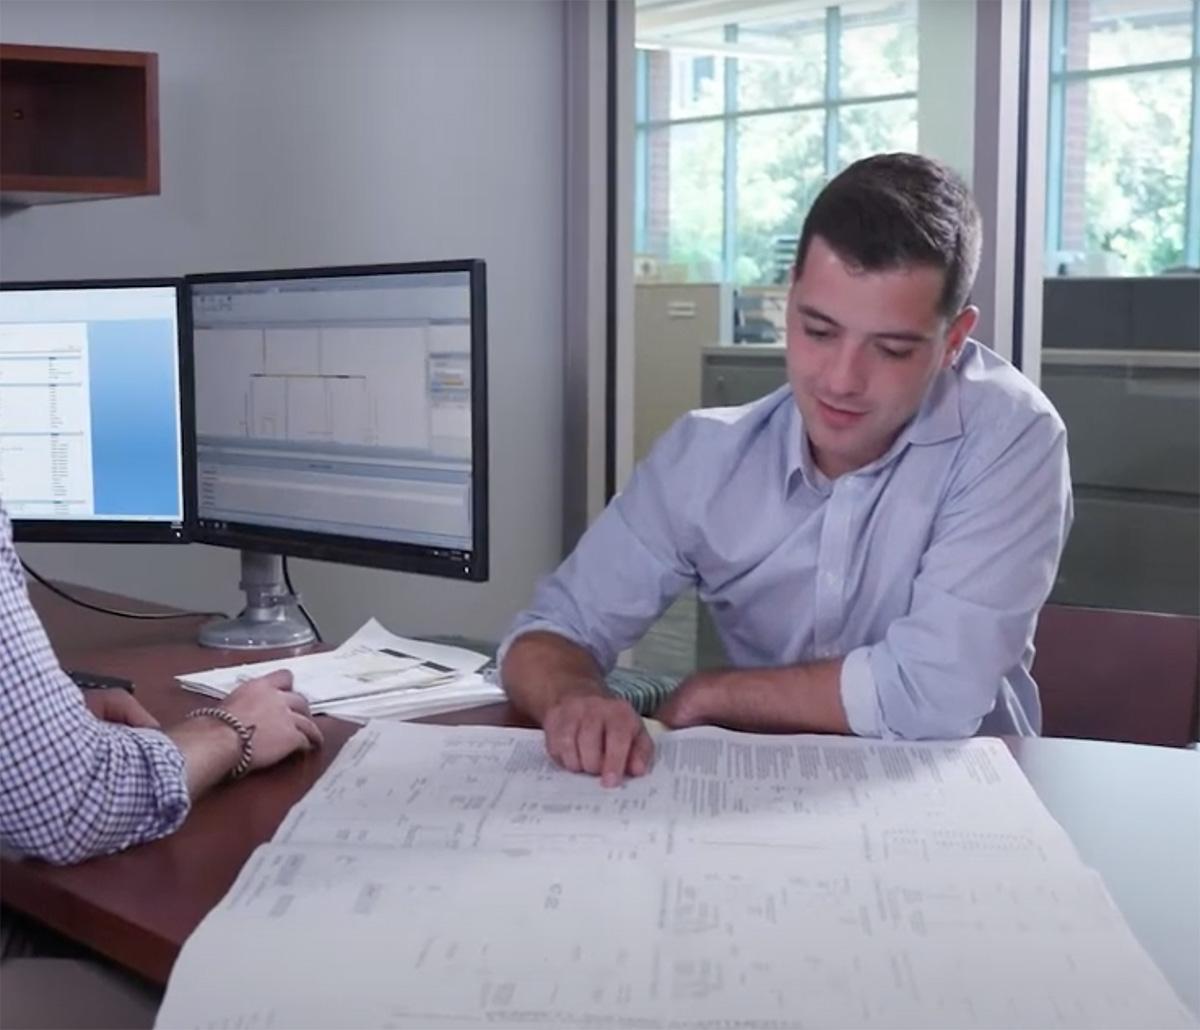 MiTek Detailing Services - Man sitting at desk looking at at detail drawings